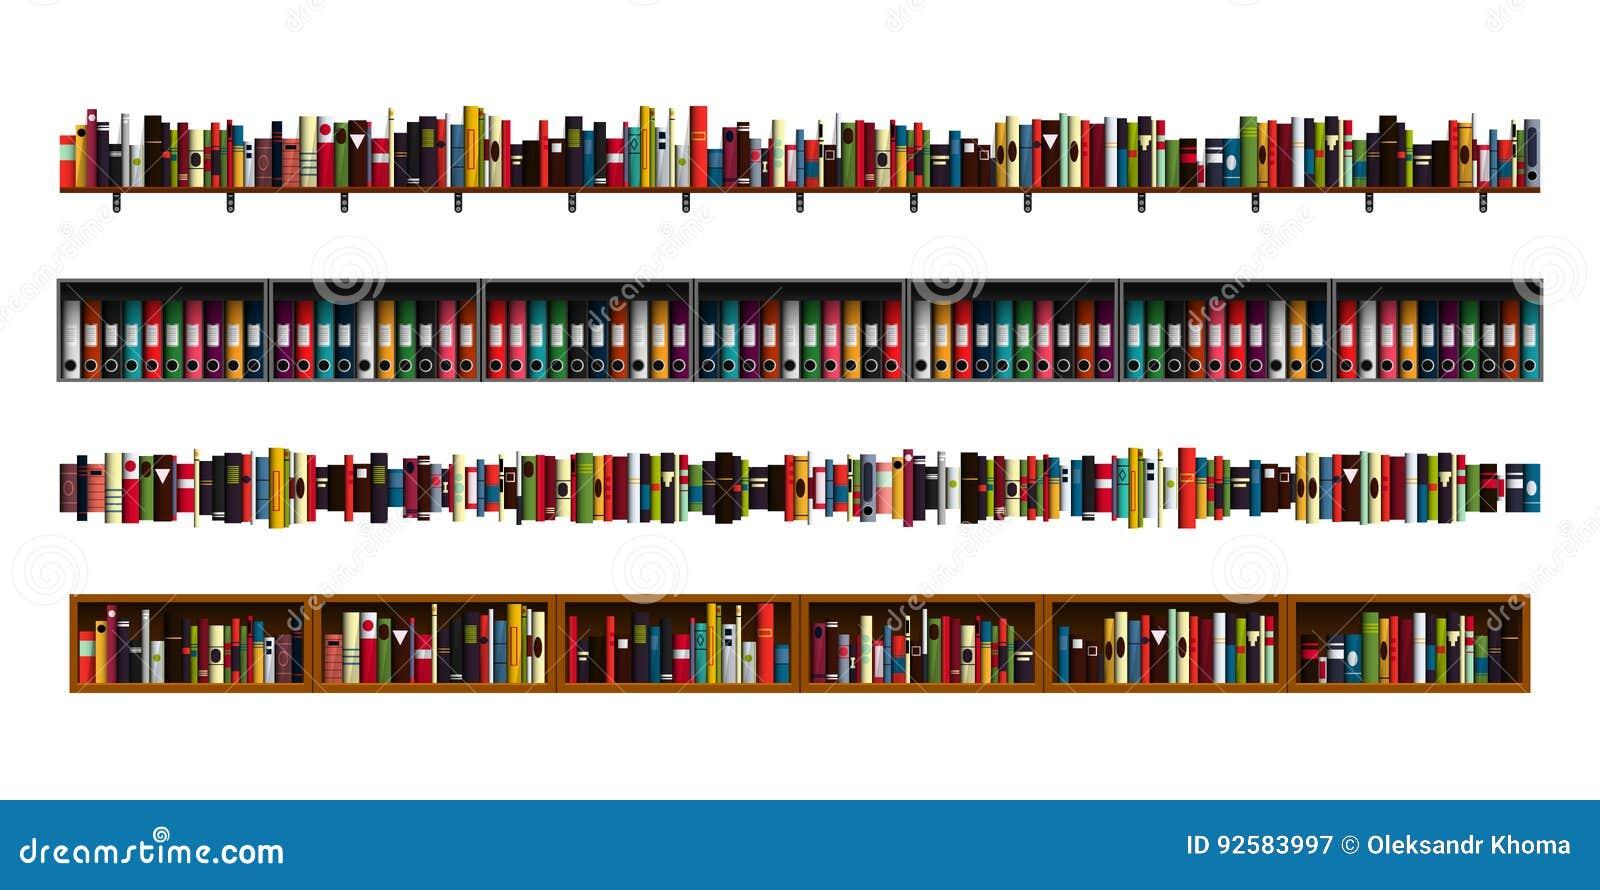 Vector Illustration Web Designs: Book Shelves Borders Set. Stock Vector. Illustration Of